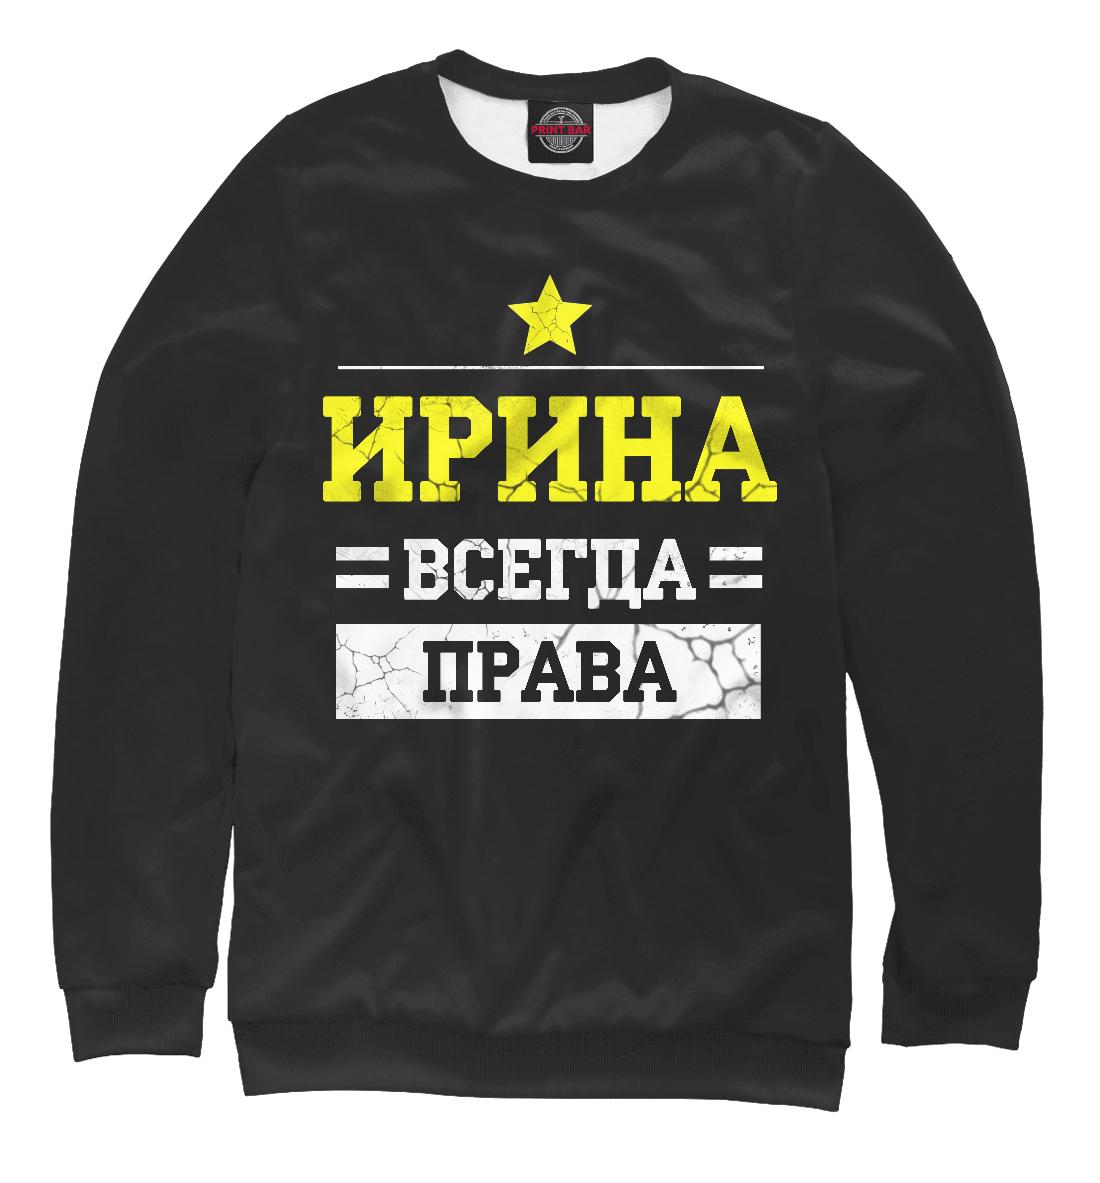 Купить Ирина, Printbar, Свитшоты, IRI-590991-swi-2